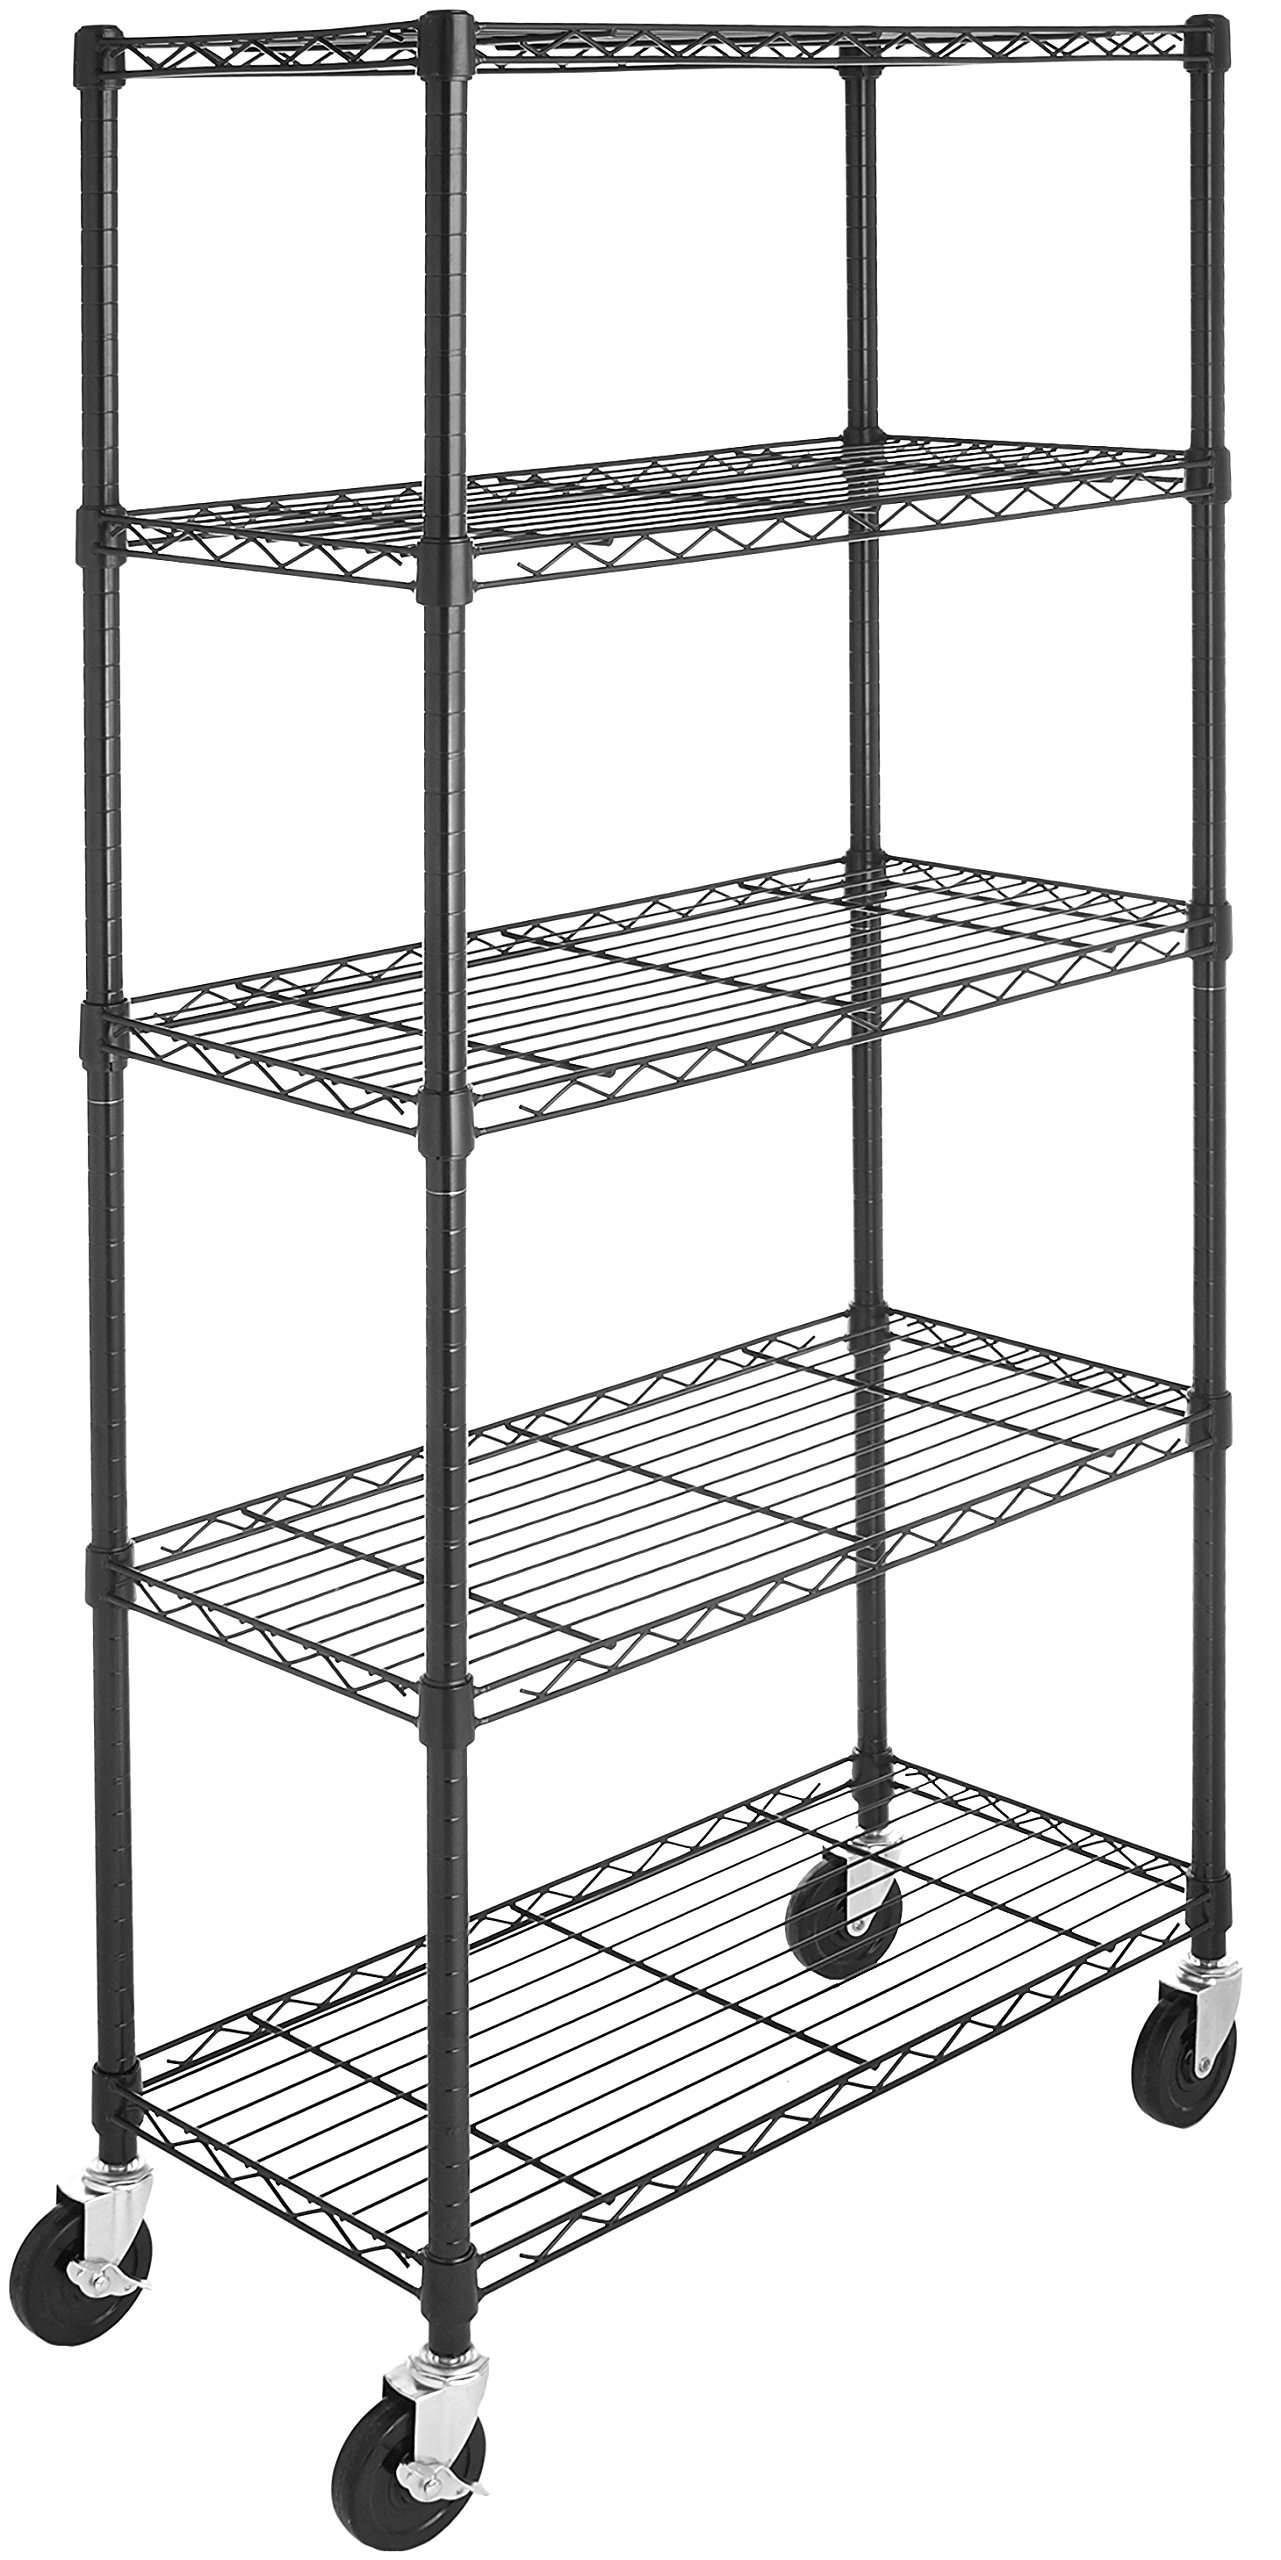 Amazon Basics 5-Shelf Shelving Storage Unit on 4'' Wheel Casters, Metal Organizer Wire Rack, Black (30L x 14W x 64.75H)